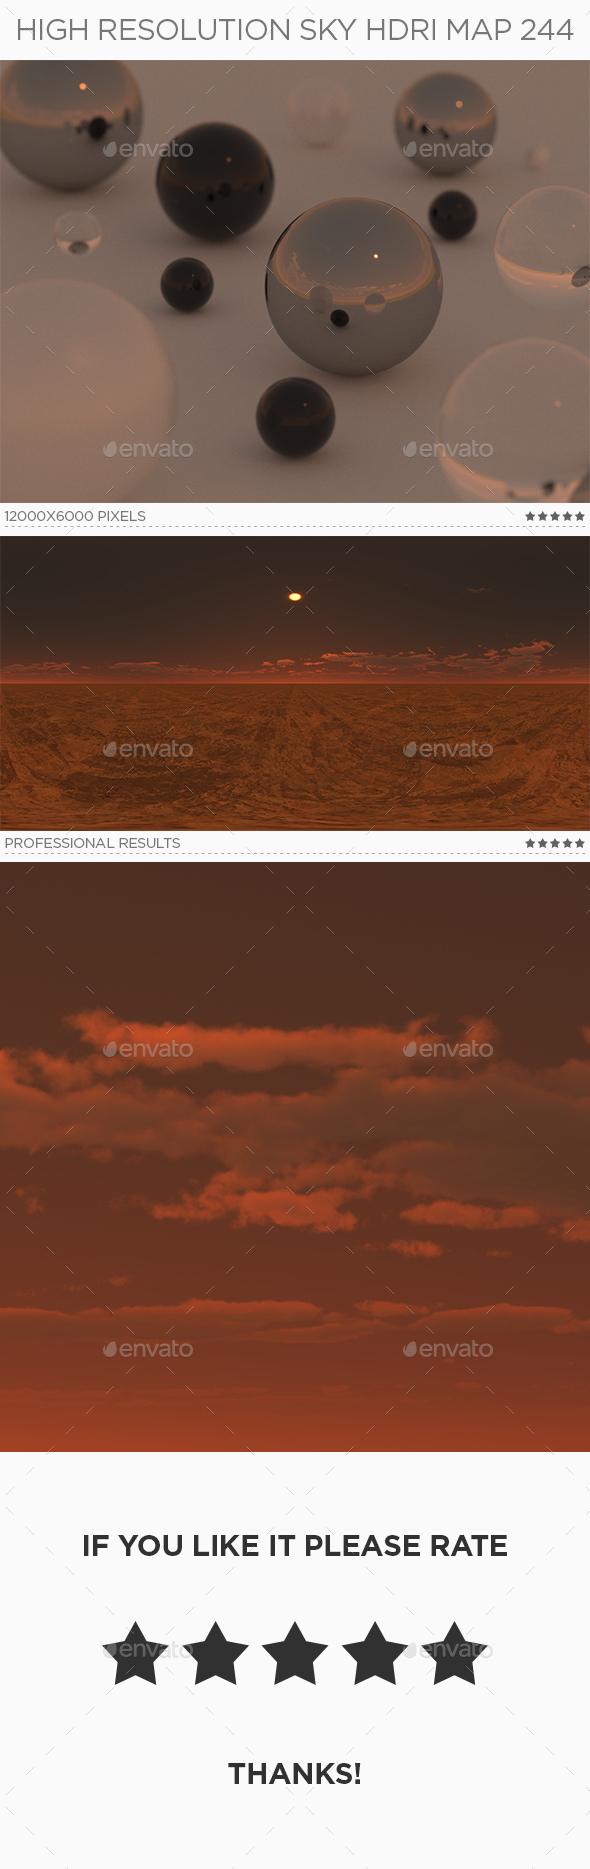 High Resolution Sky HDRi Map 244 - 3DOcean Item for Sale